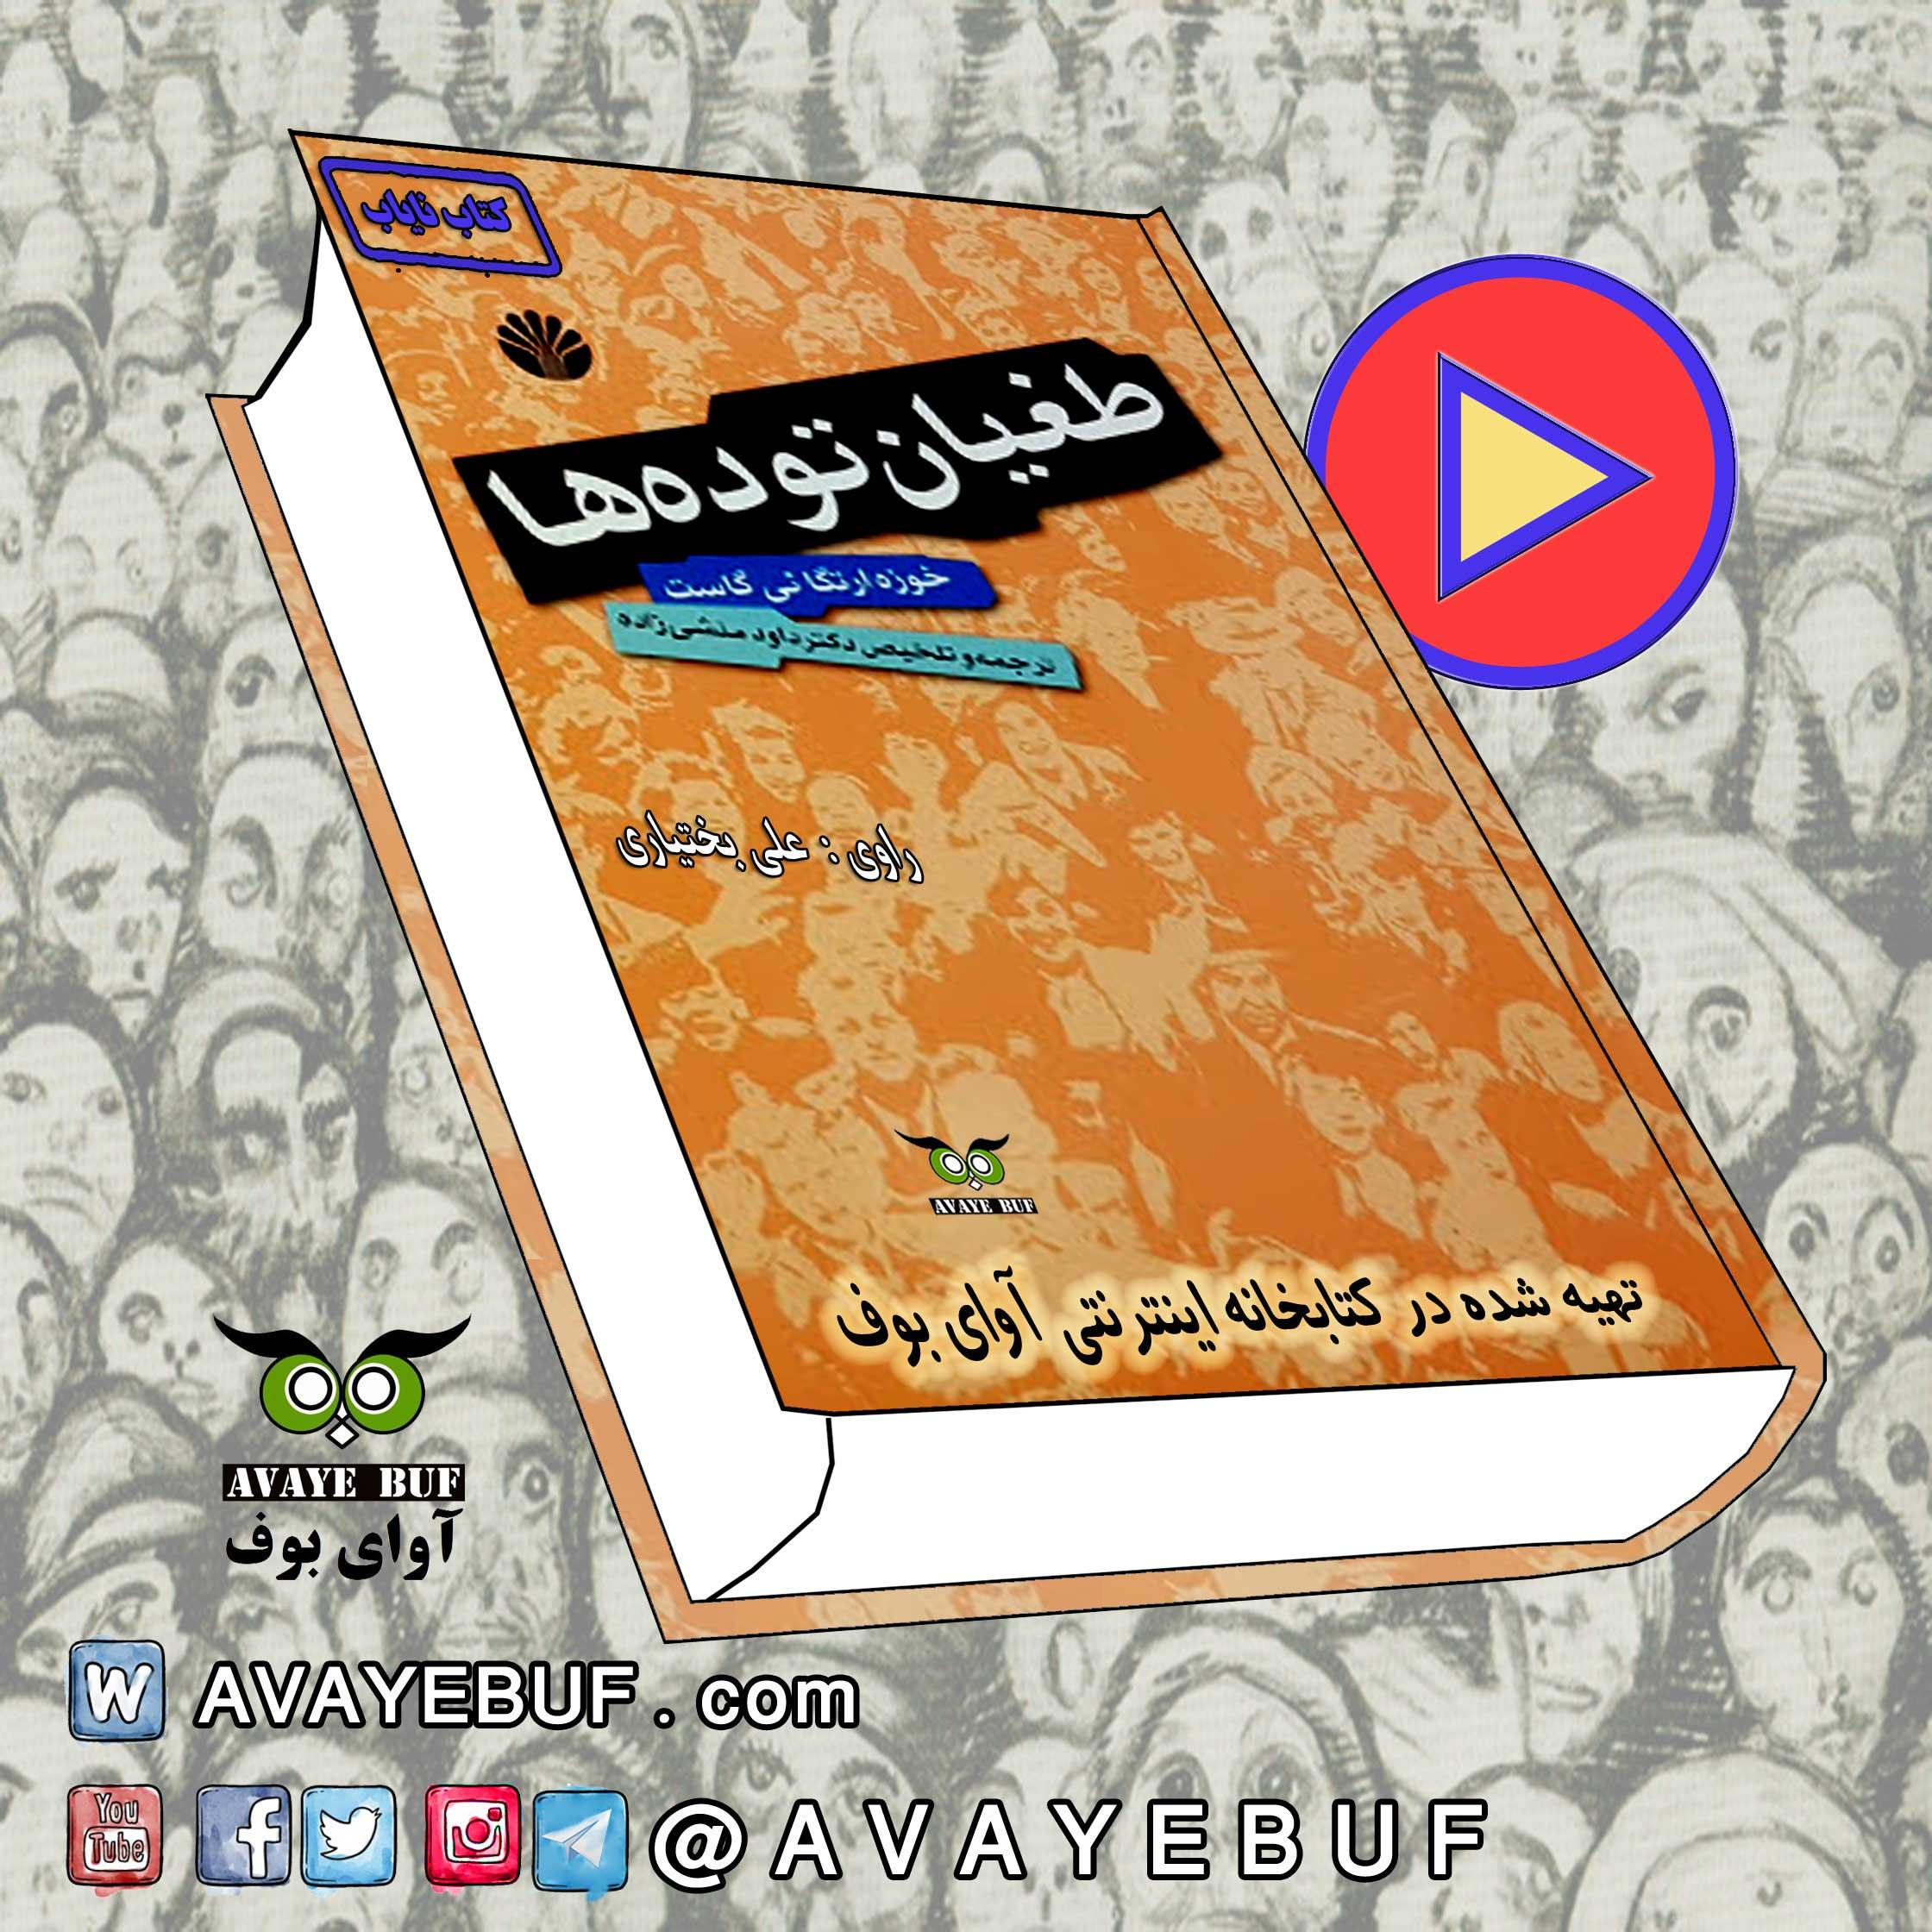 tude_avayebuf.com_